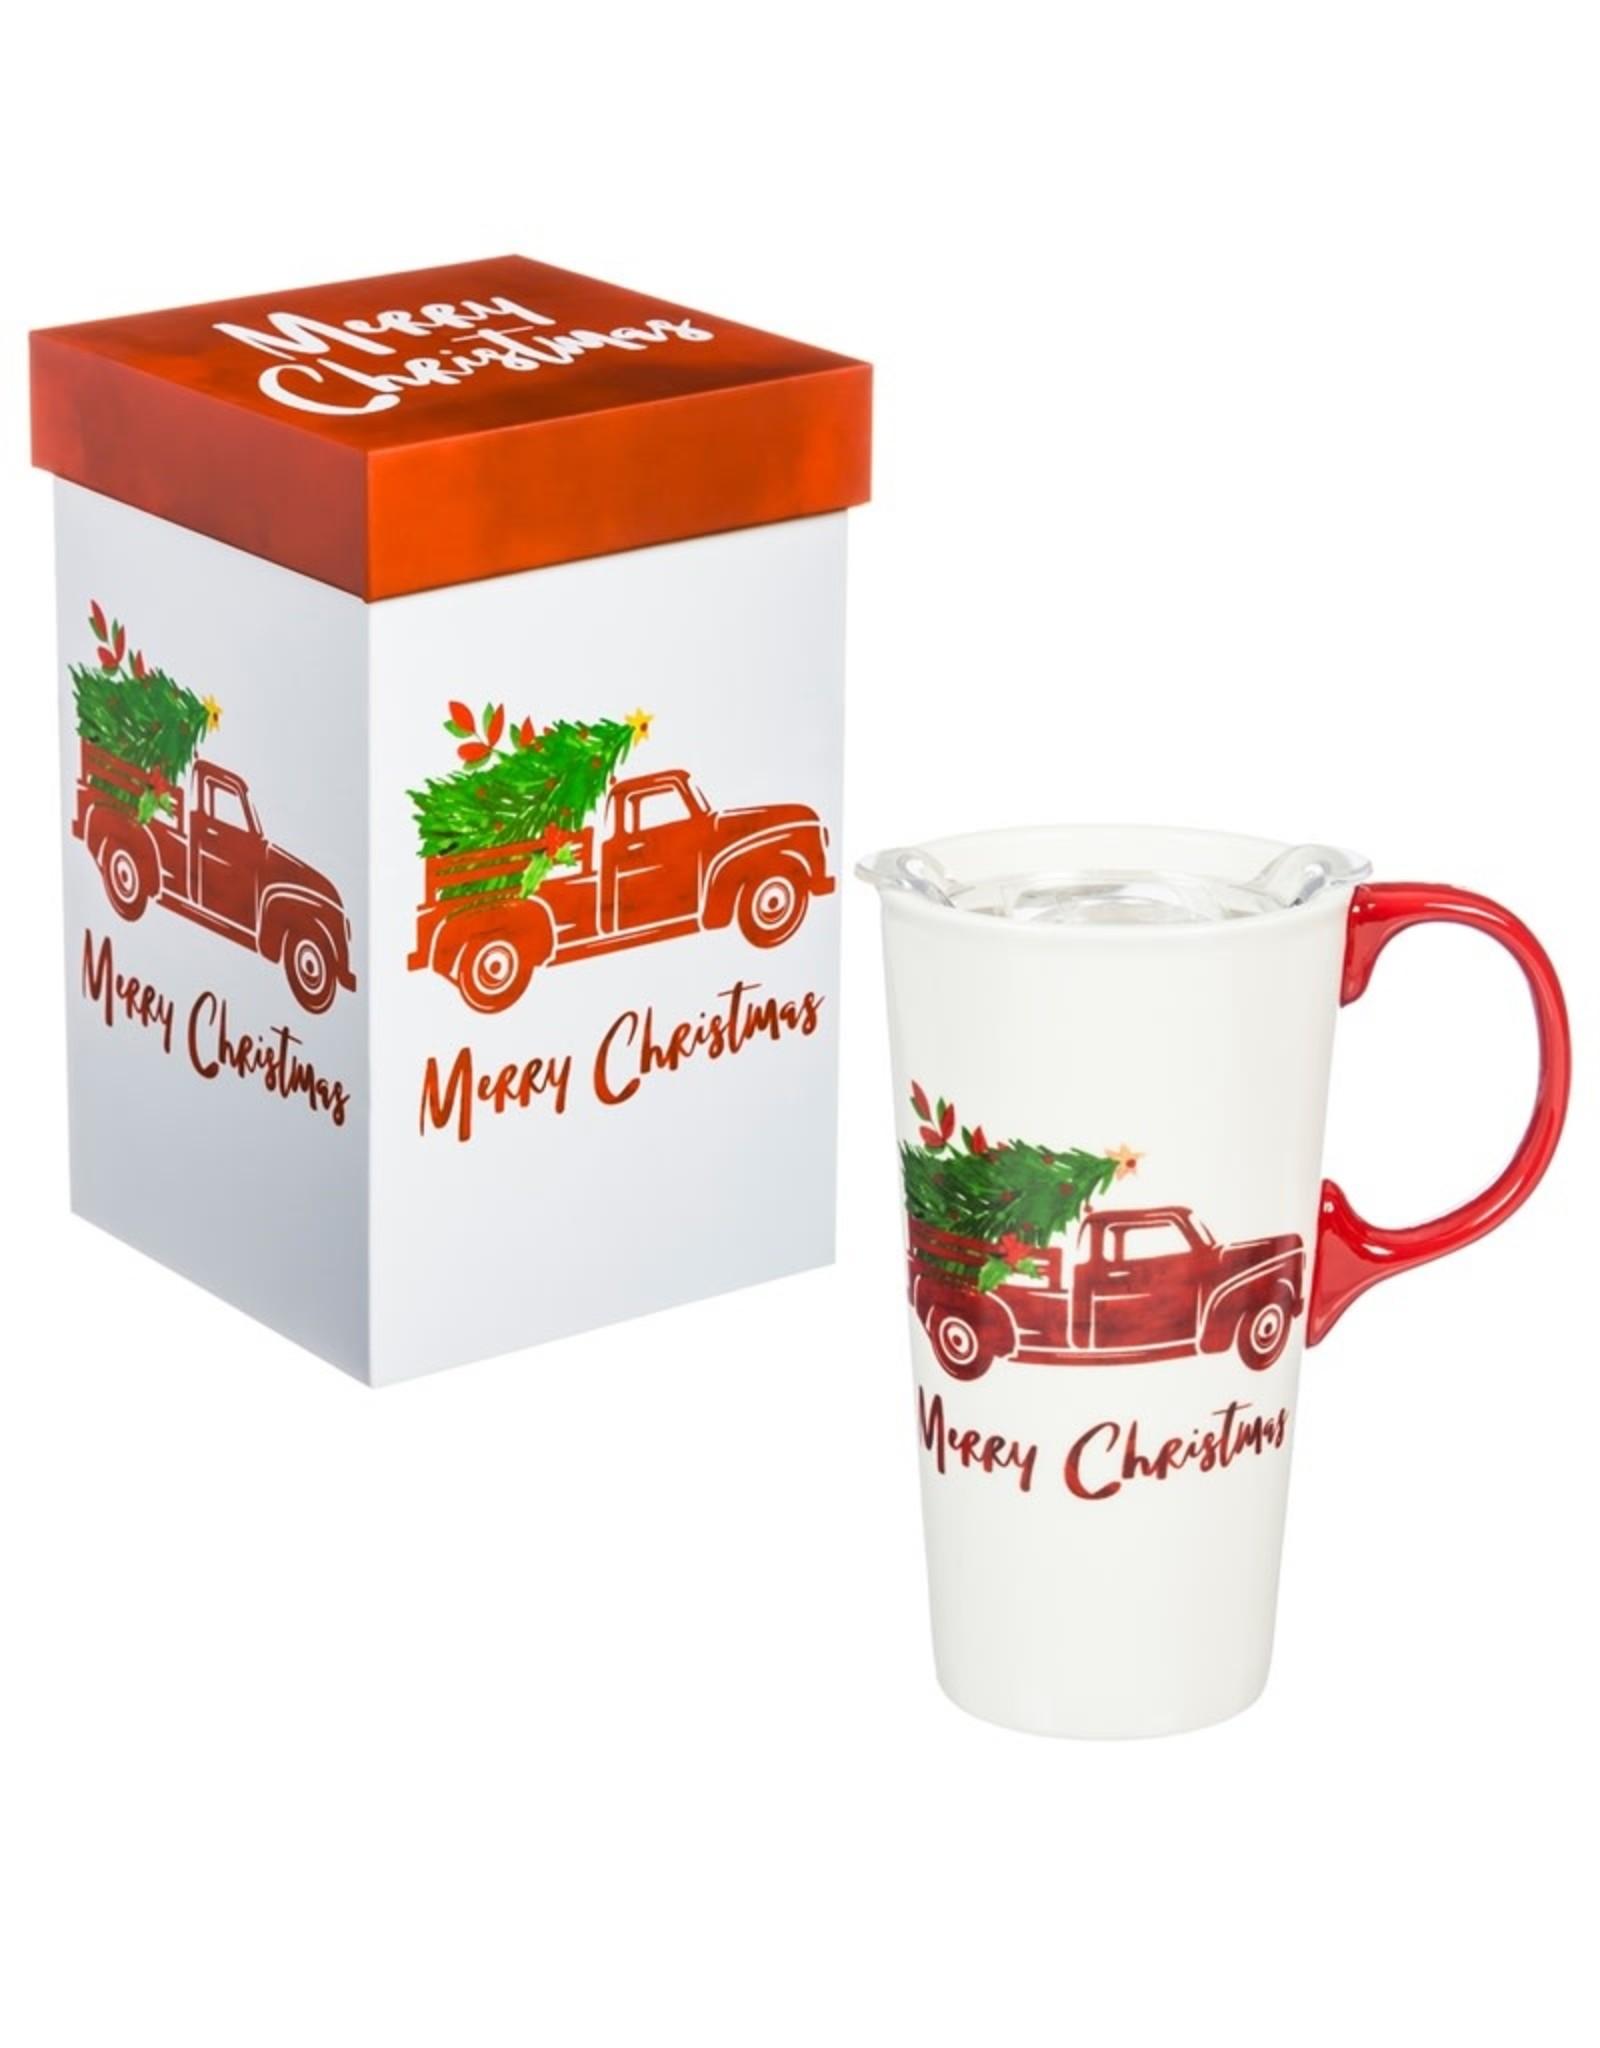 Evergreen Enterprises Ceramic Travel Cup w/box and Tritan Lid, Holiday Destination